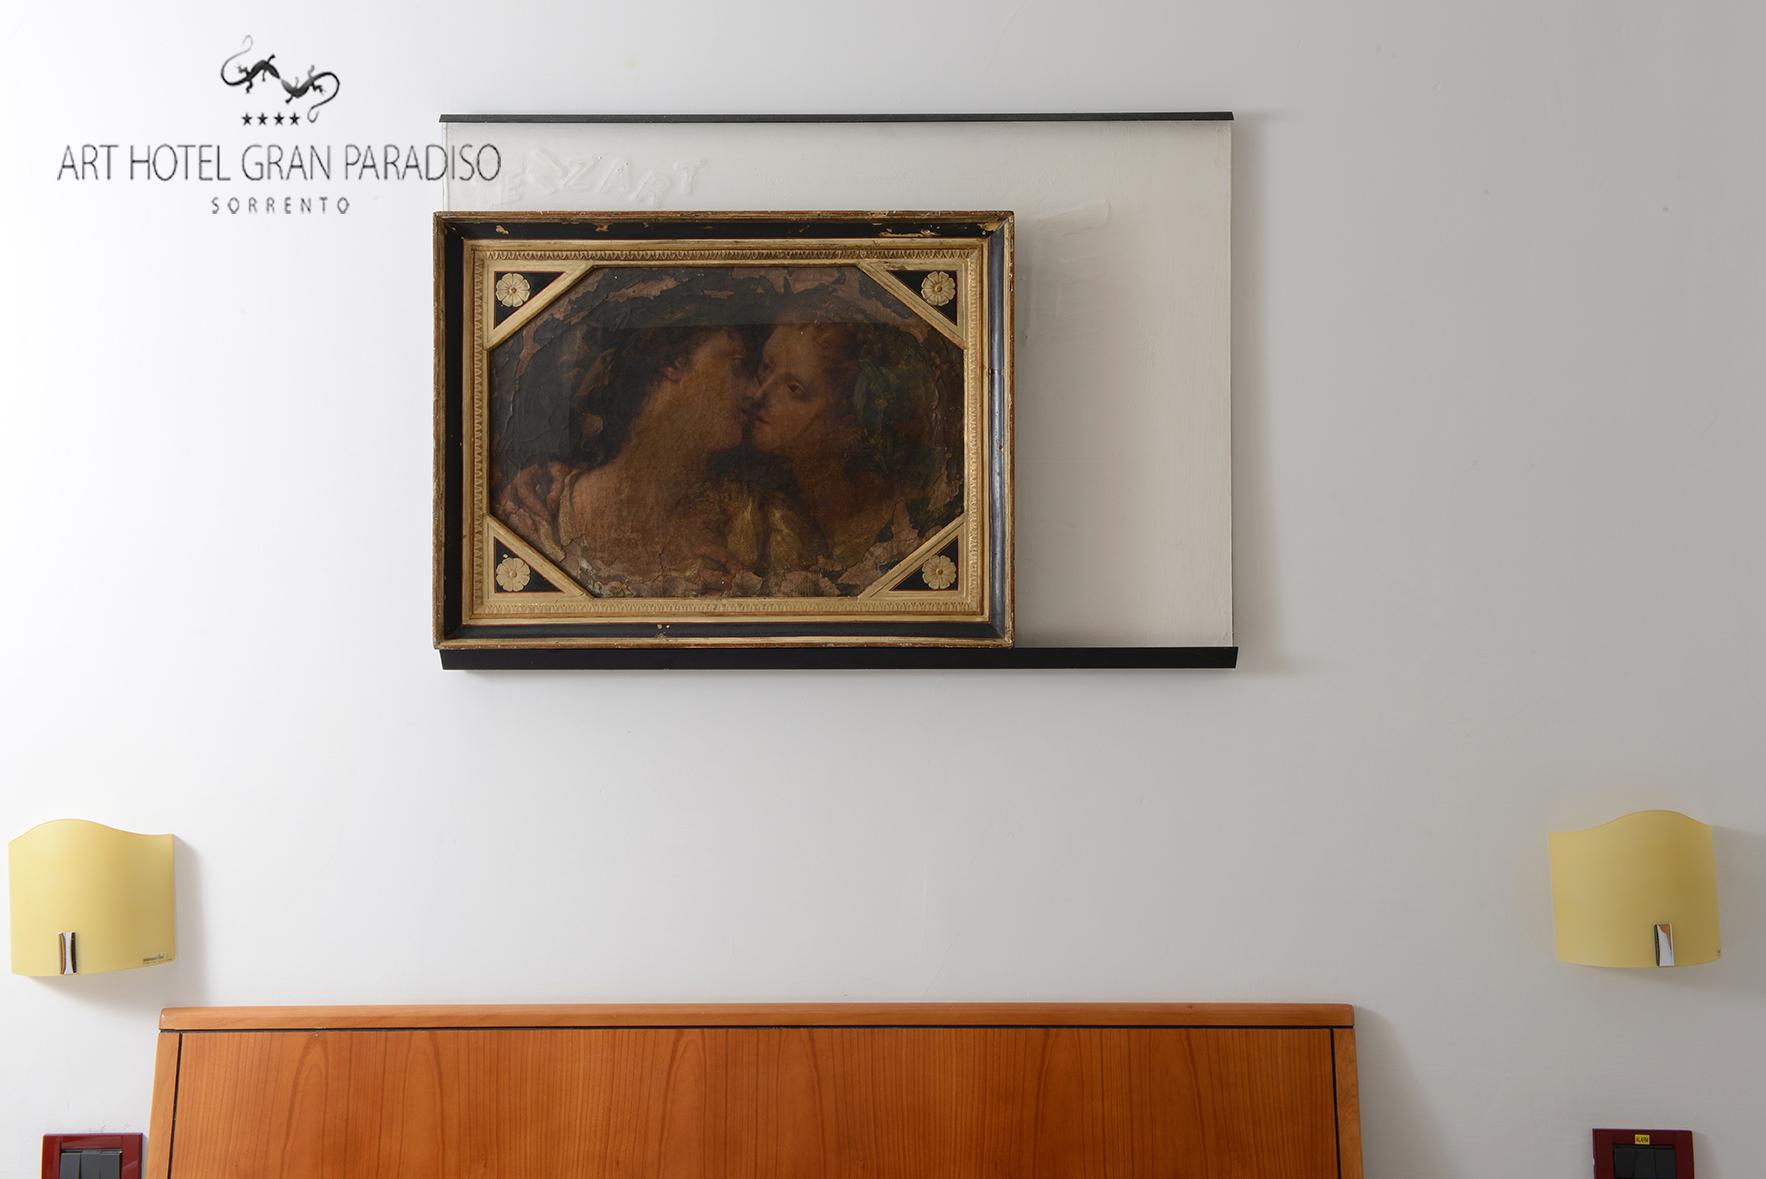 Art_Hotel_Gran_Paradiso_2013_313_Fabio_Mauri_1.jpg